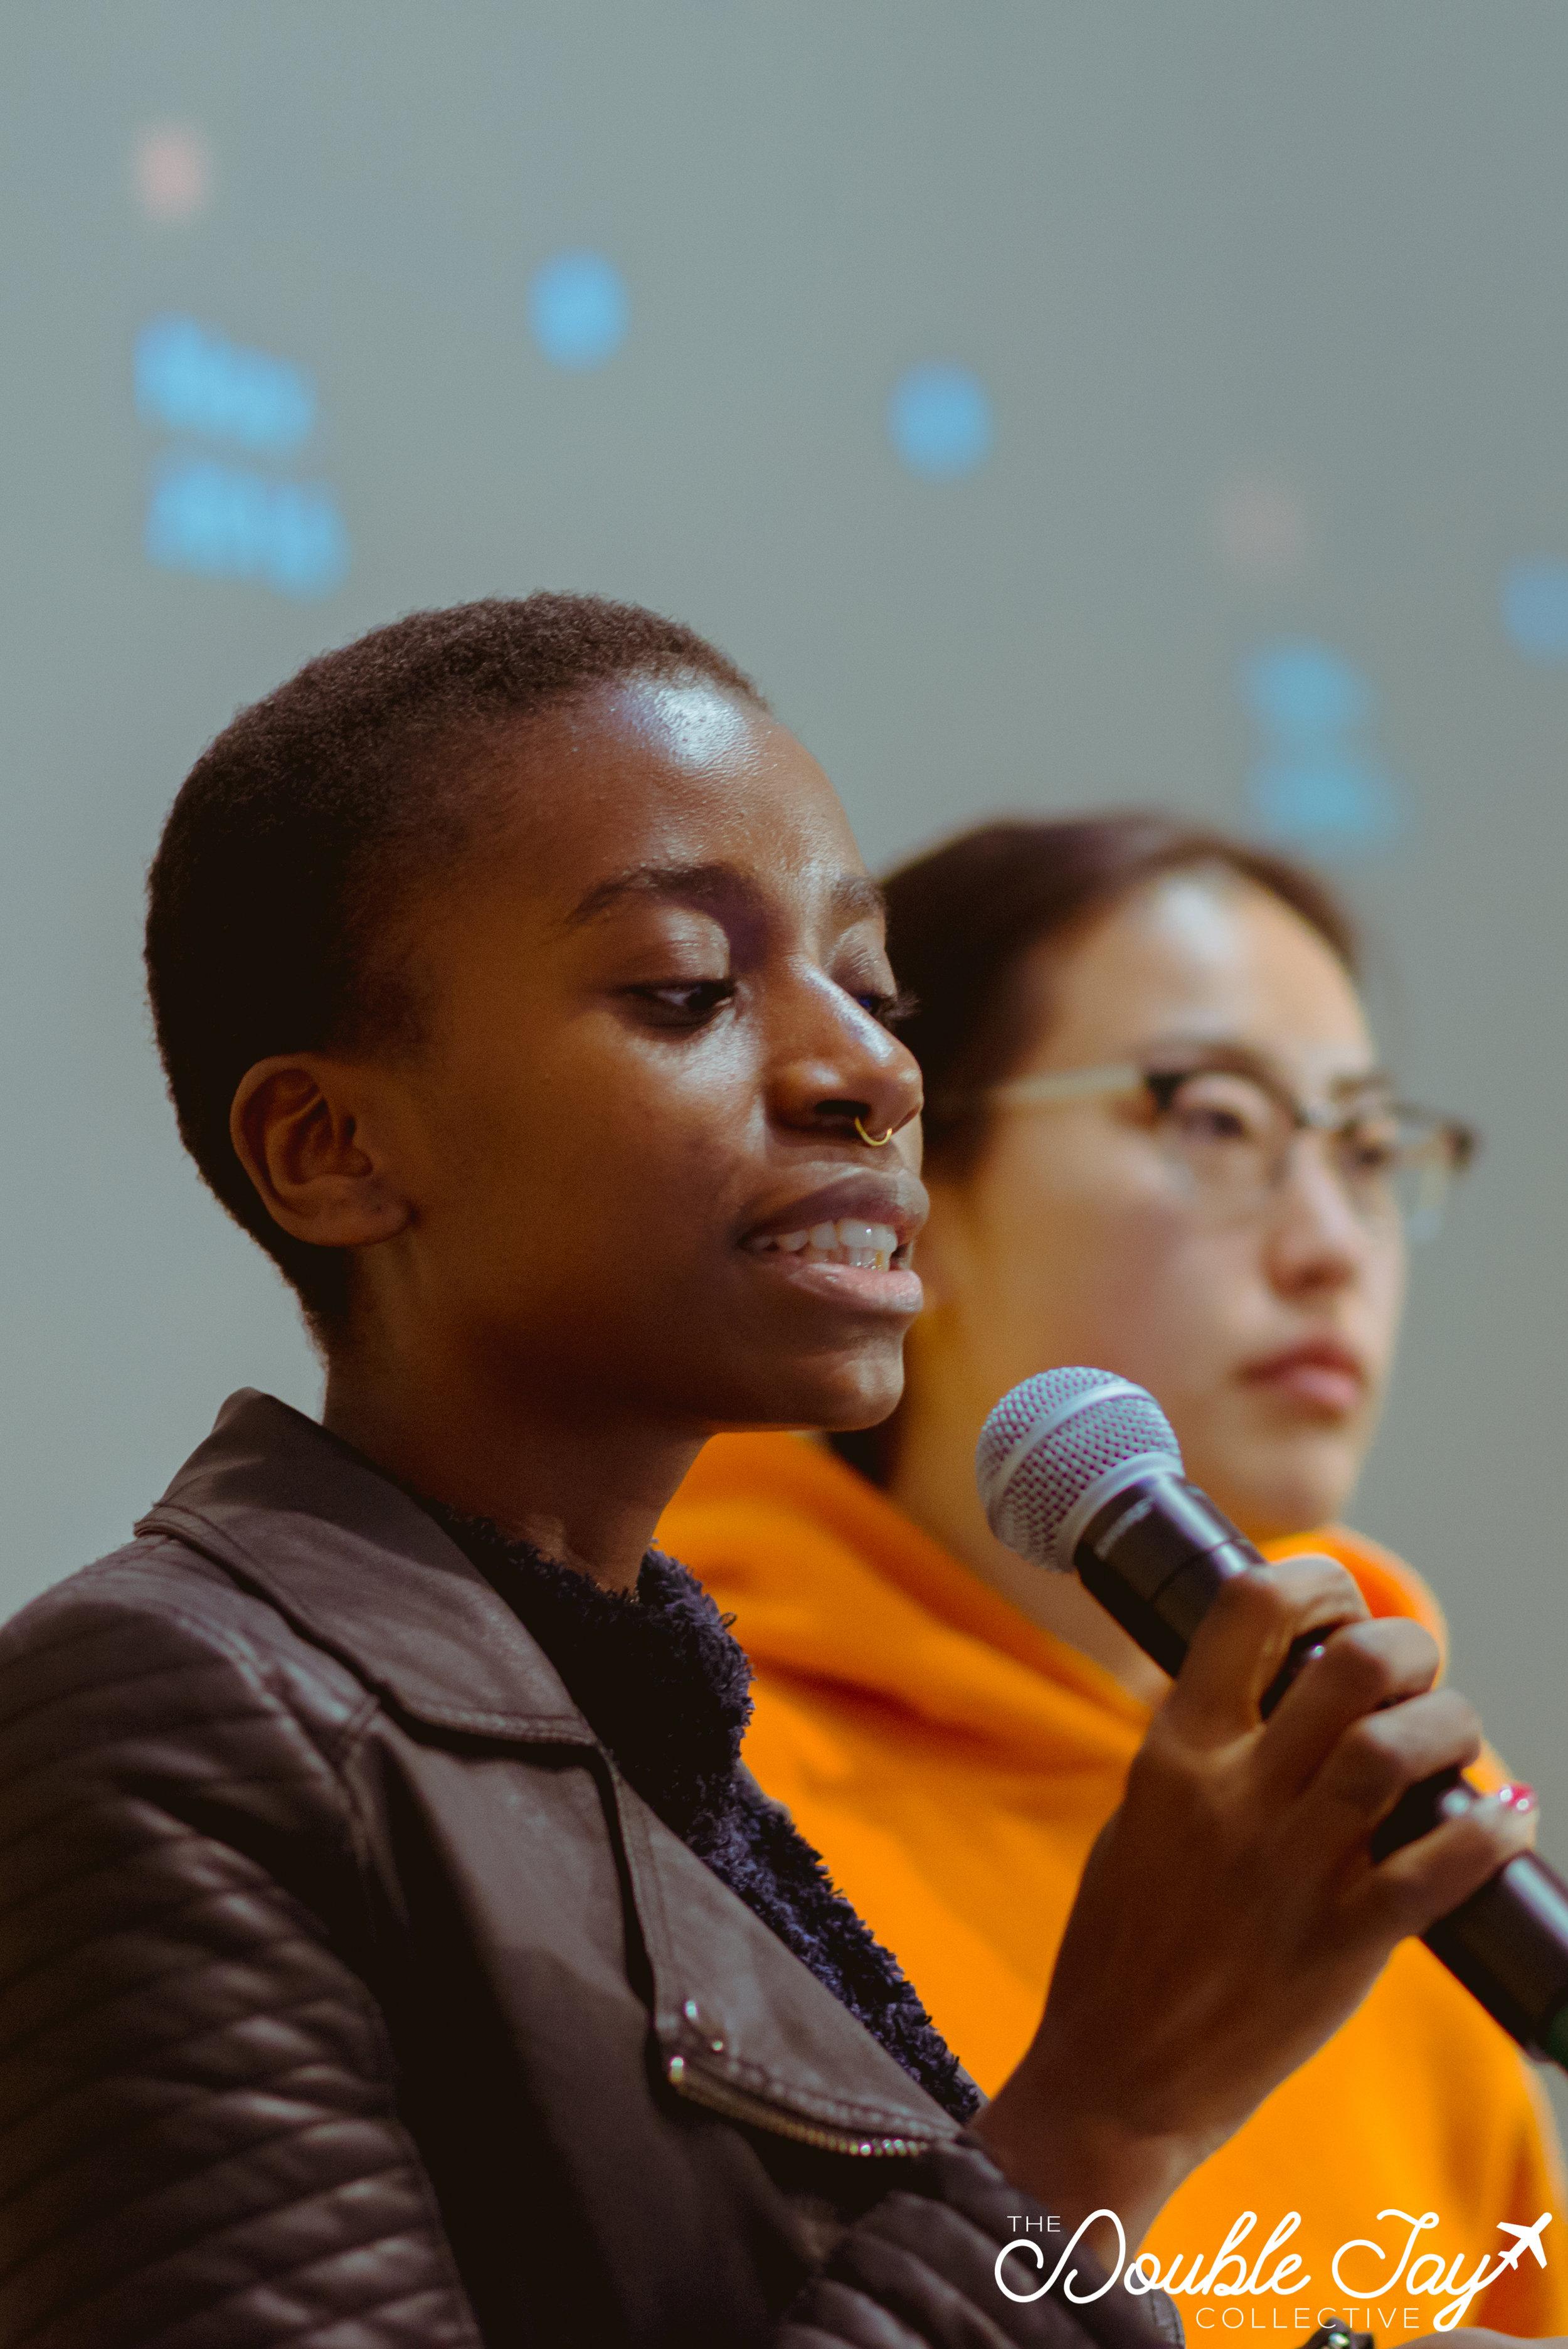 Marie Kamukuny, student at Western University, and member of OESC.